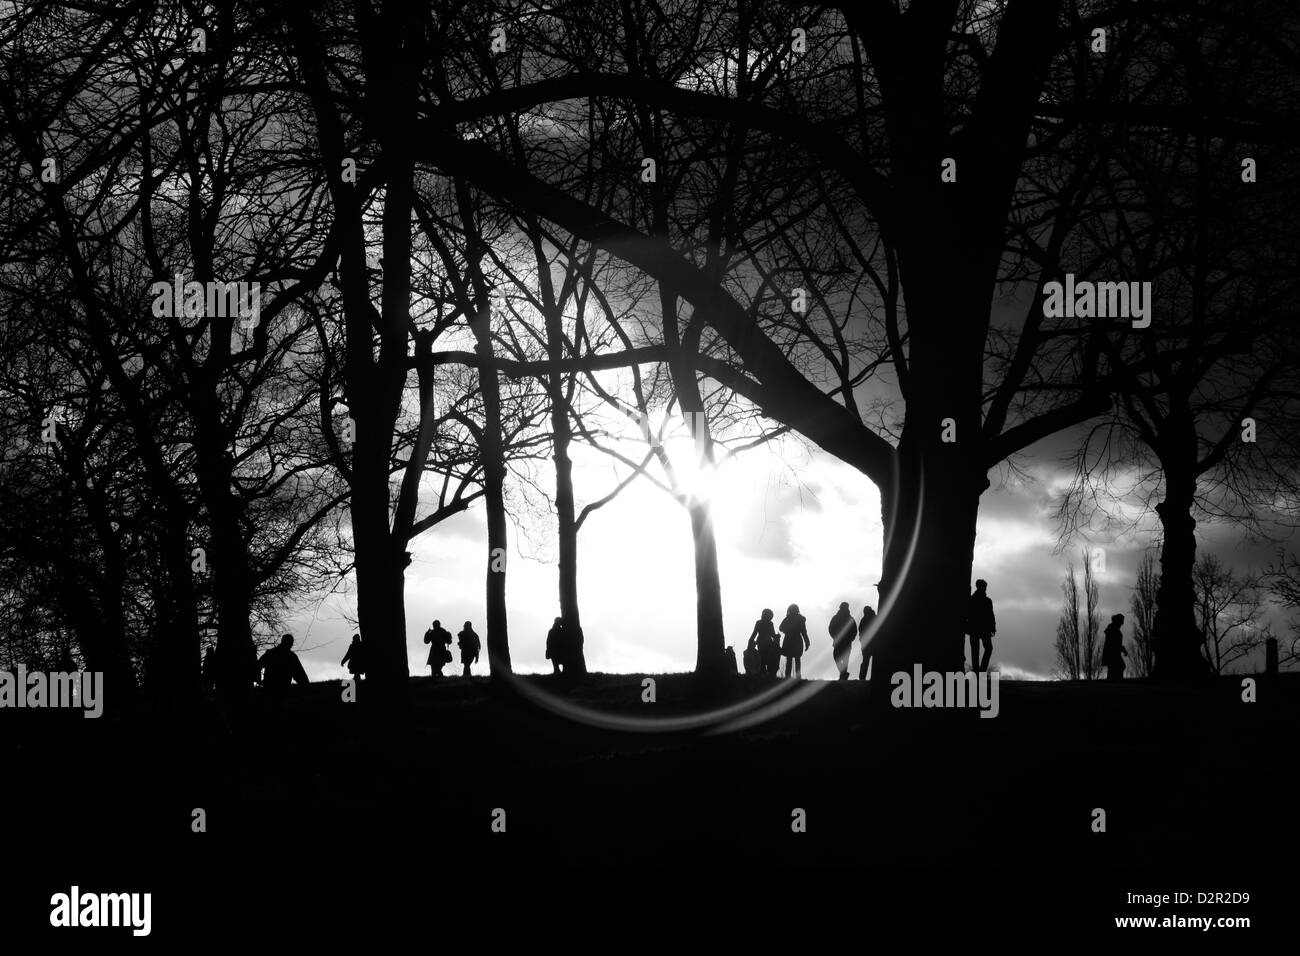 Walkers strolling through Hampstead Heath, Hampstead, London, UK - Stock Image